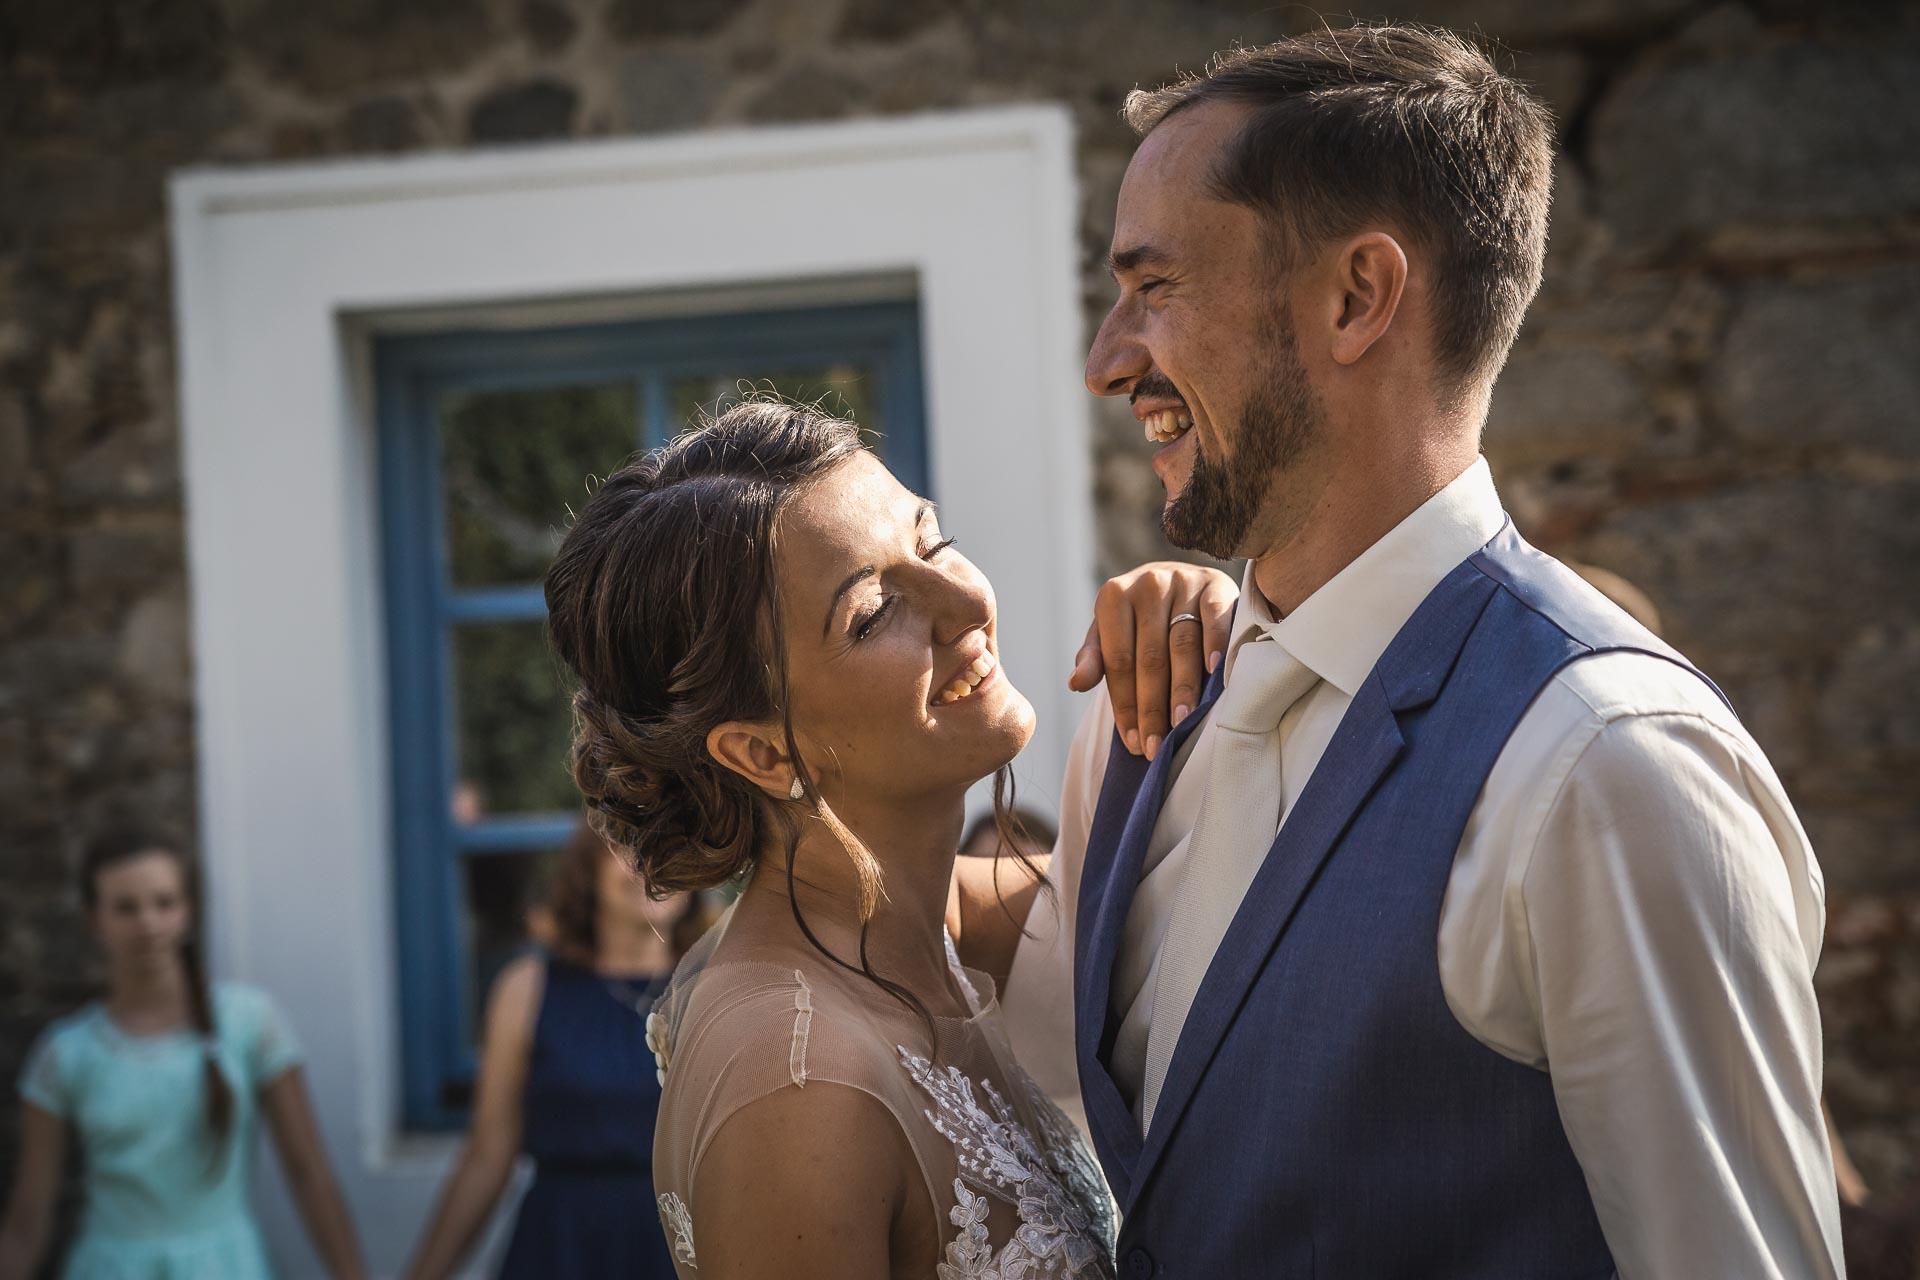 svatební-fotograf-wedding-svatebni-video-orlík-vltava-kostel-statek-stodola-boho-svatba-Beautyfoto-440